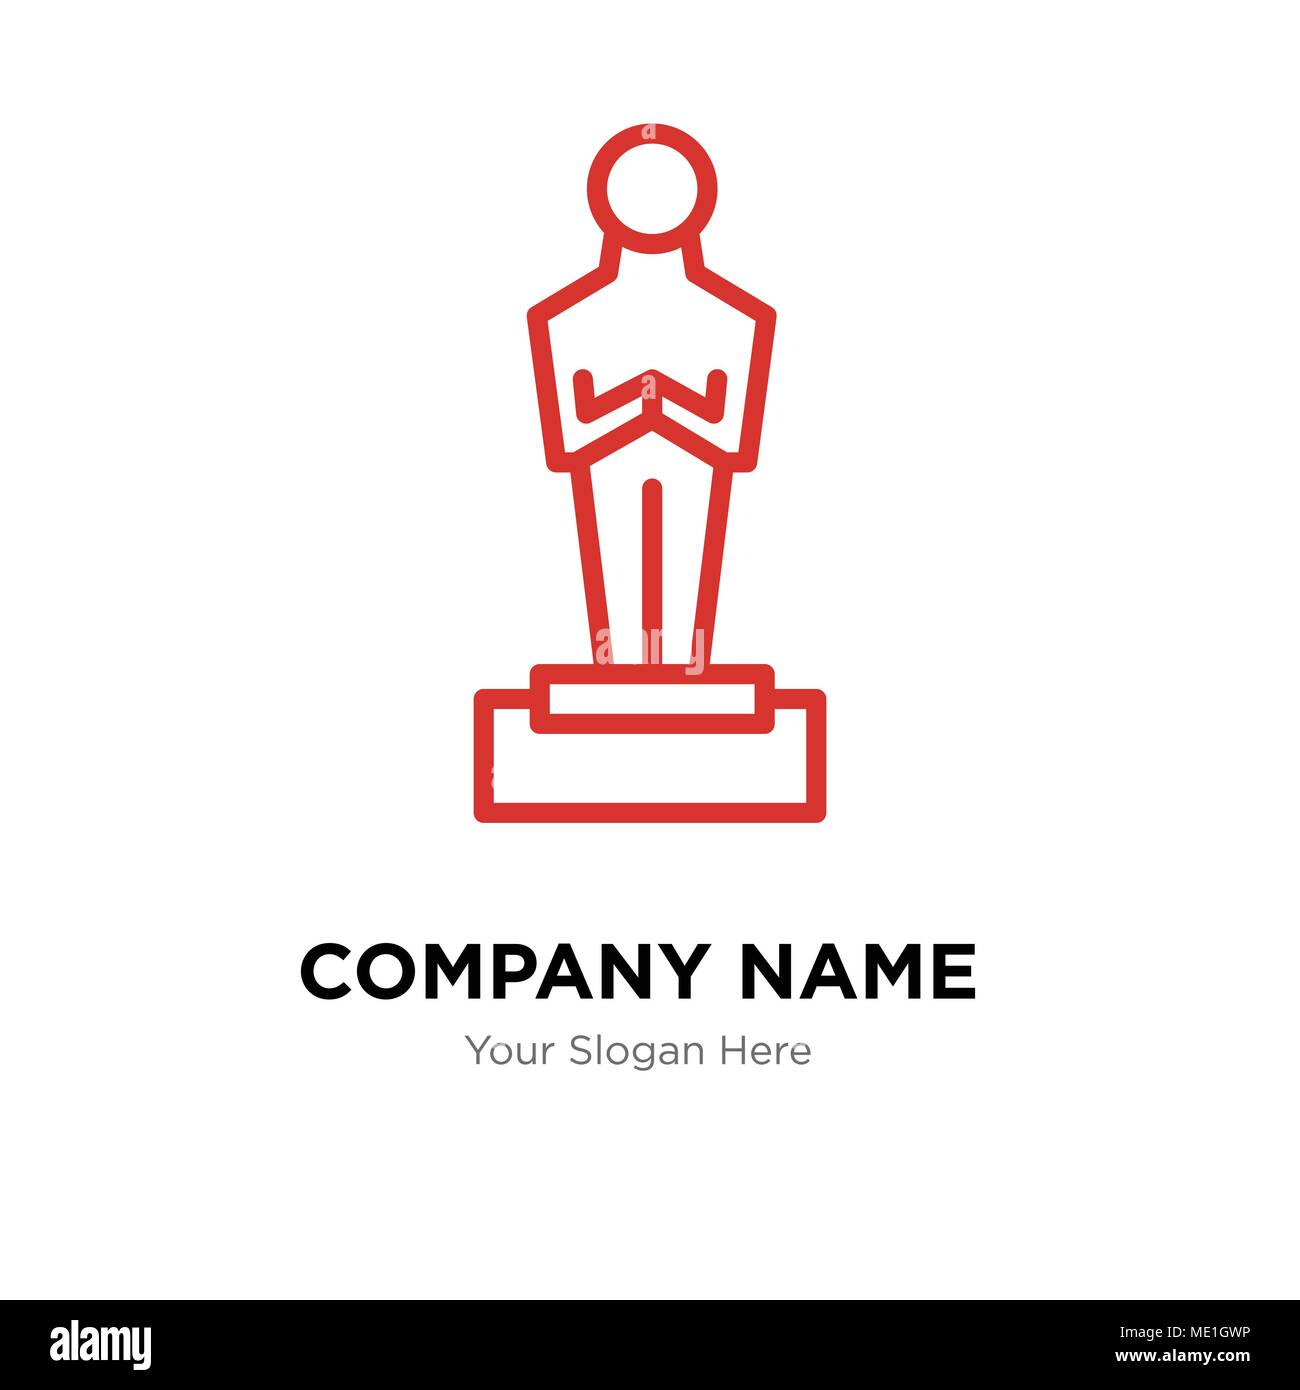 Oscar Company Logo Design Template Business Corporate Vector Icon